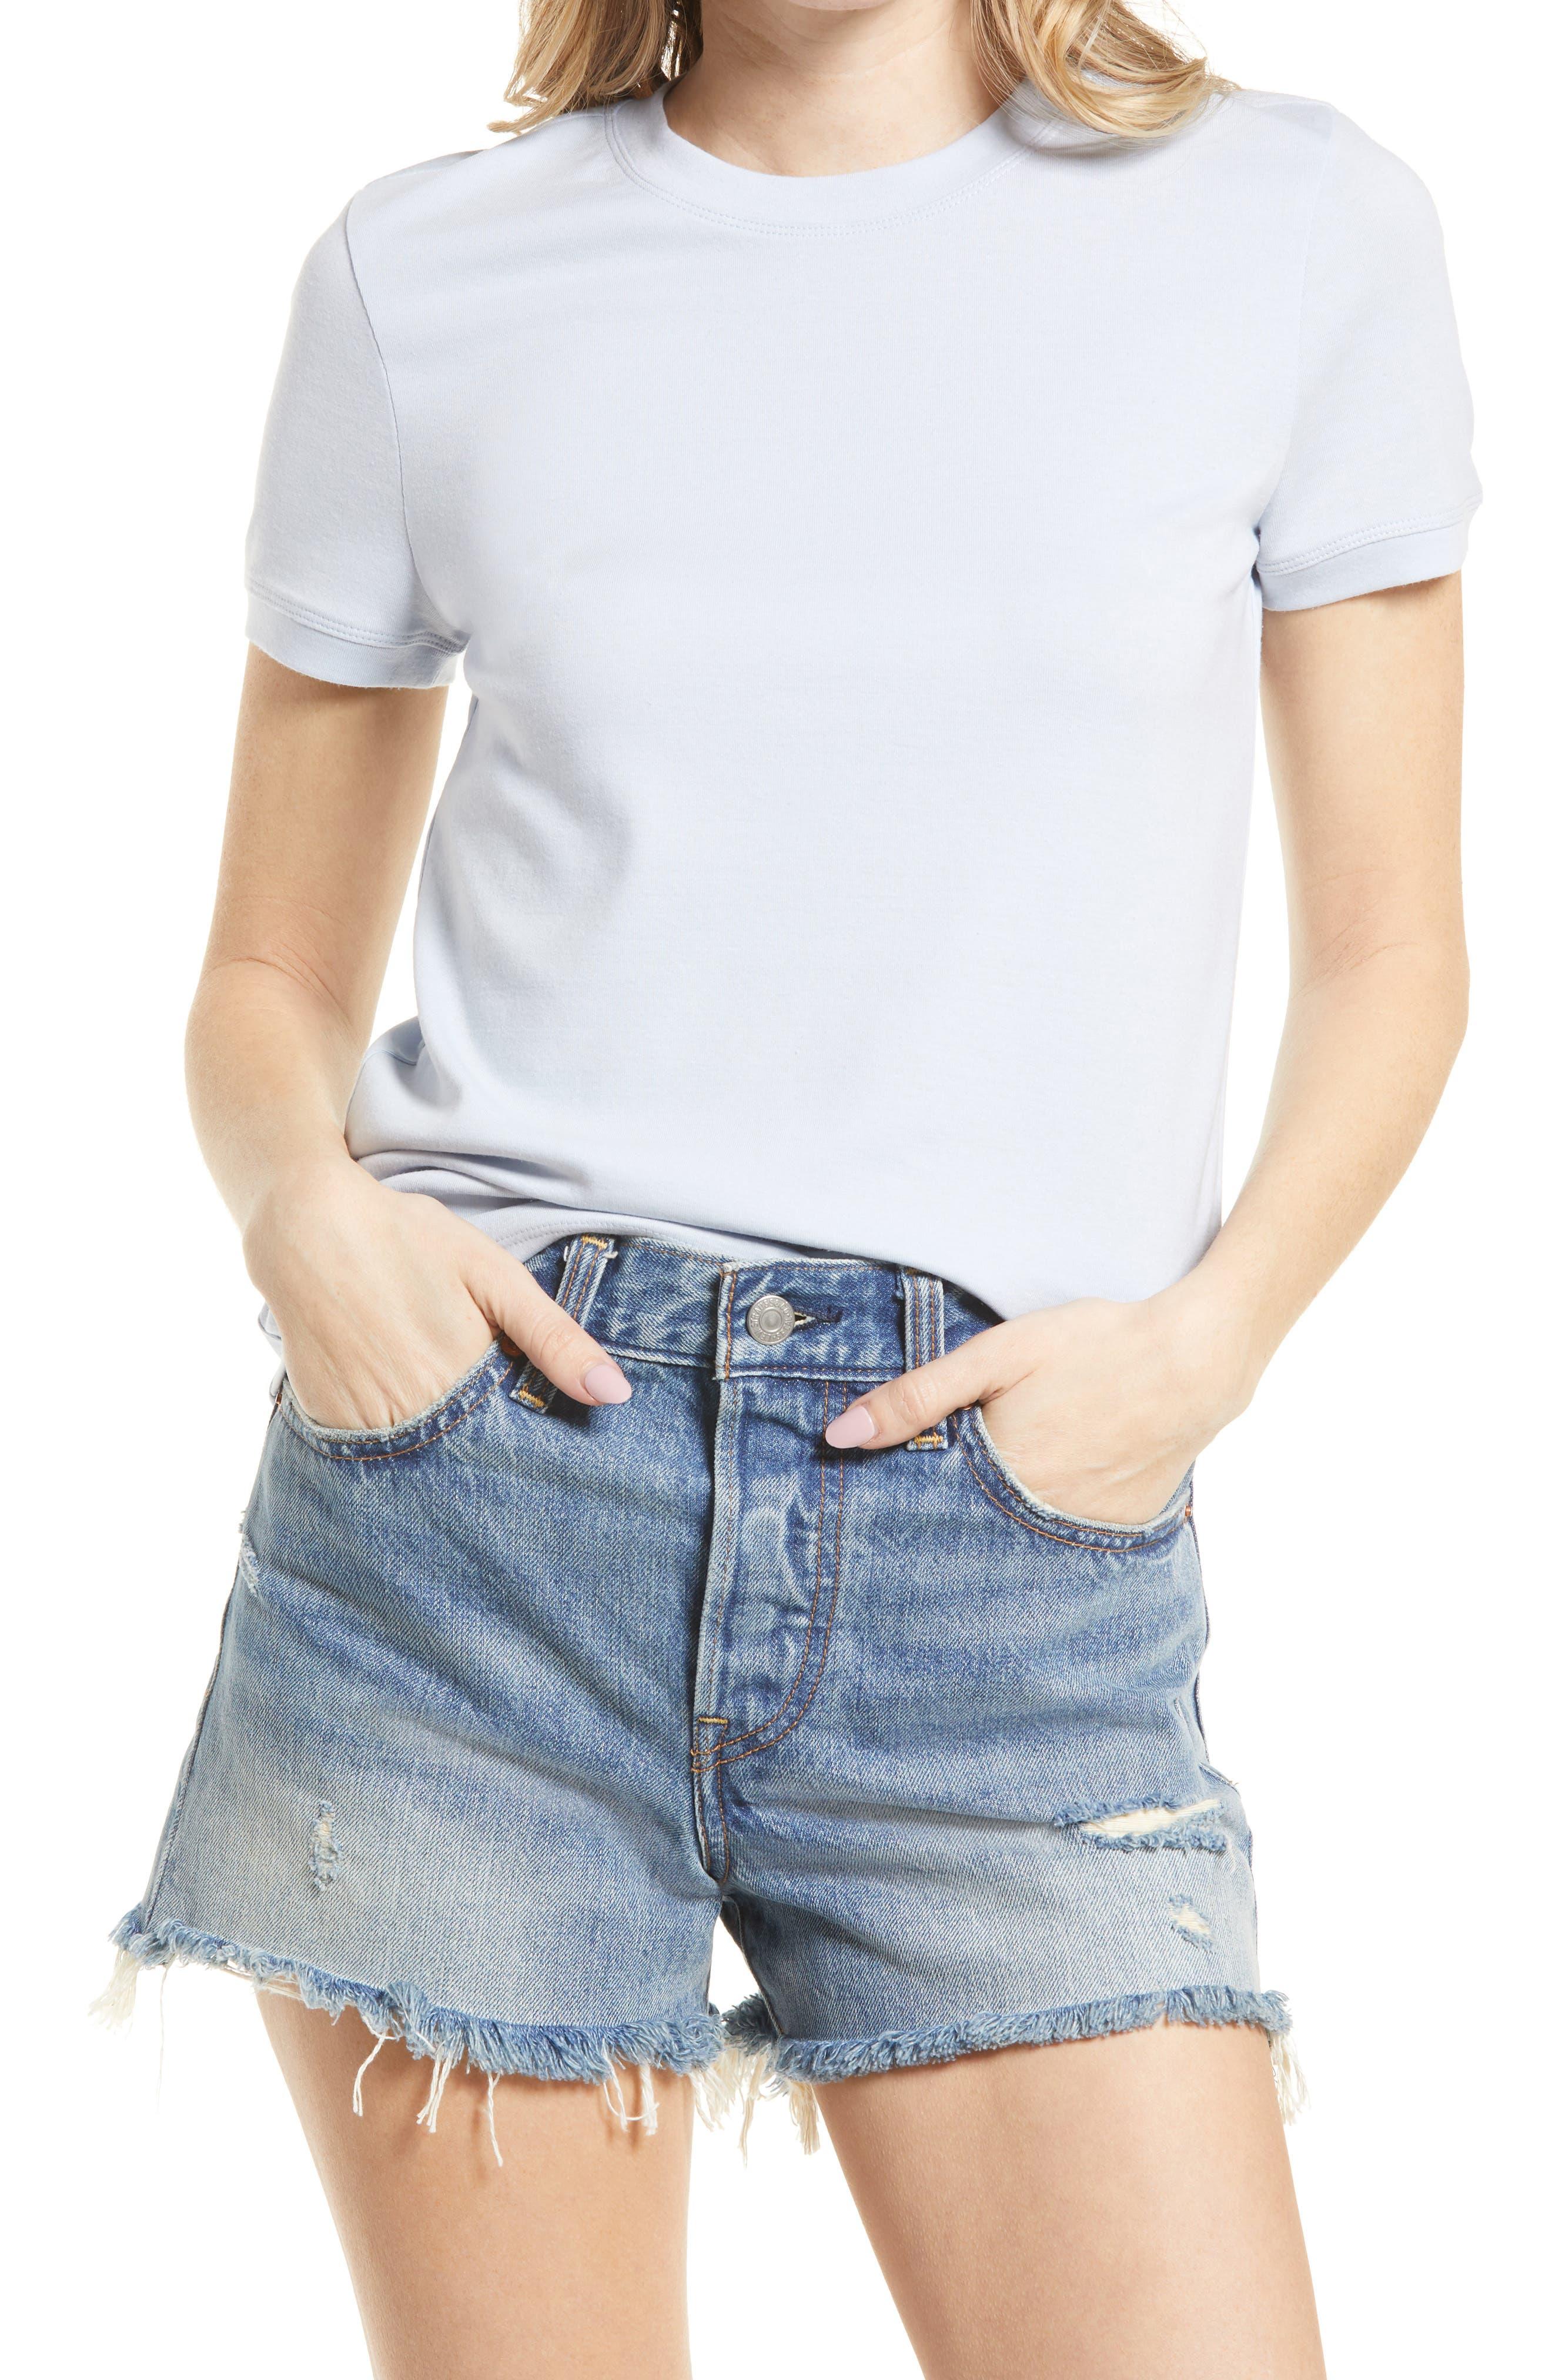 50s Shirts & Tops Womens Treasure  Bond Tonal Ringer T-Shirt Size X-Small - Blue $29.00 AT vintagedancer.com